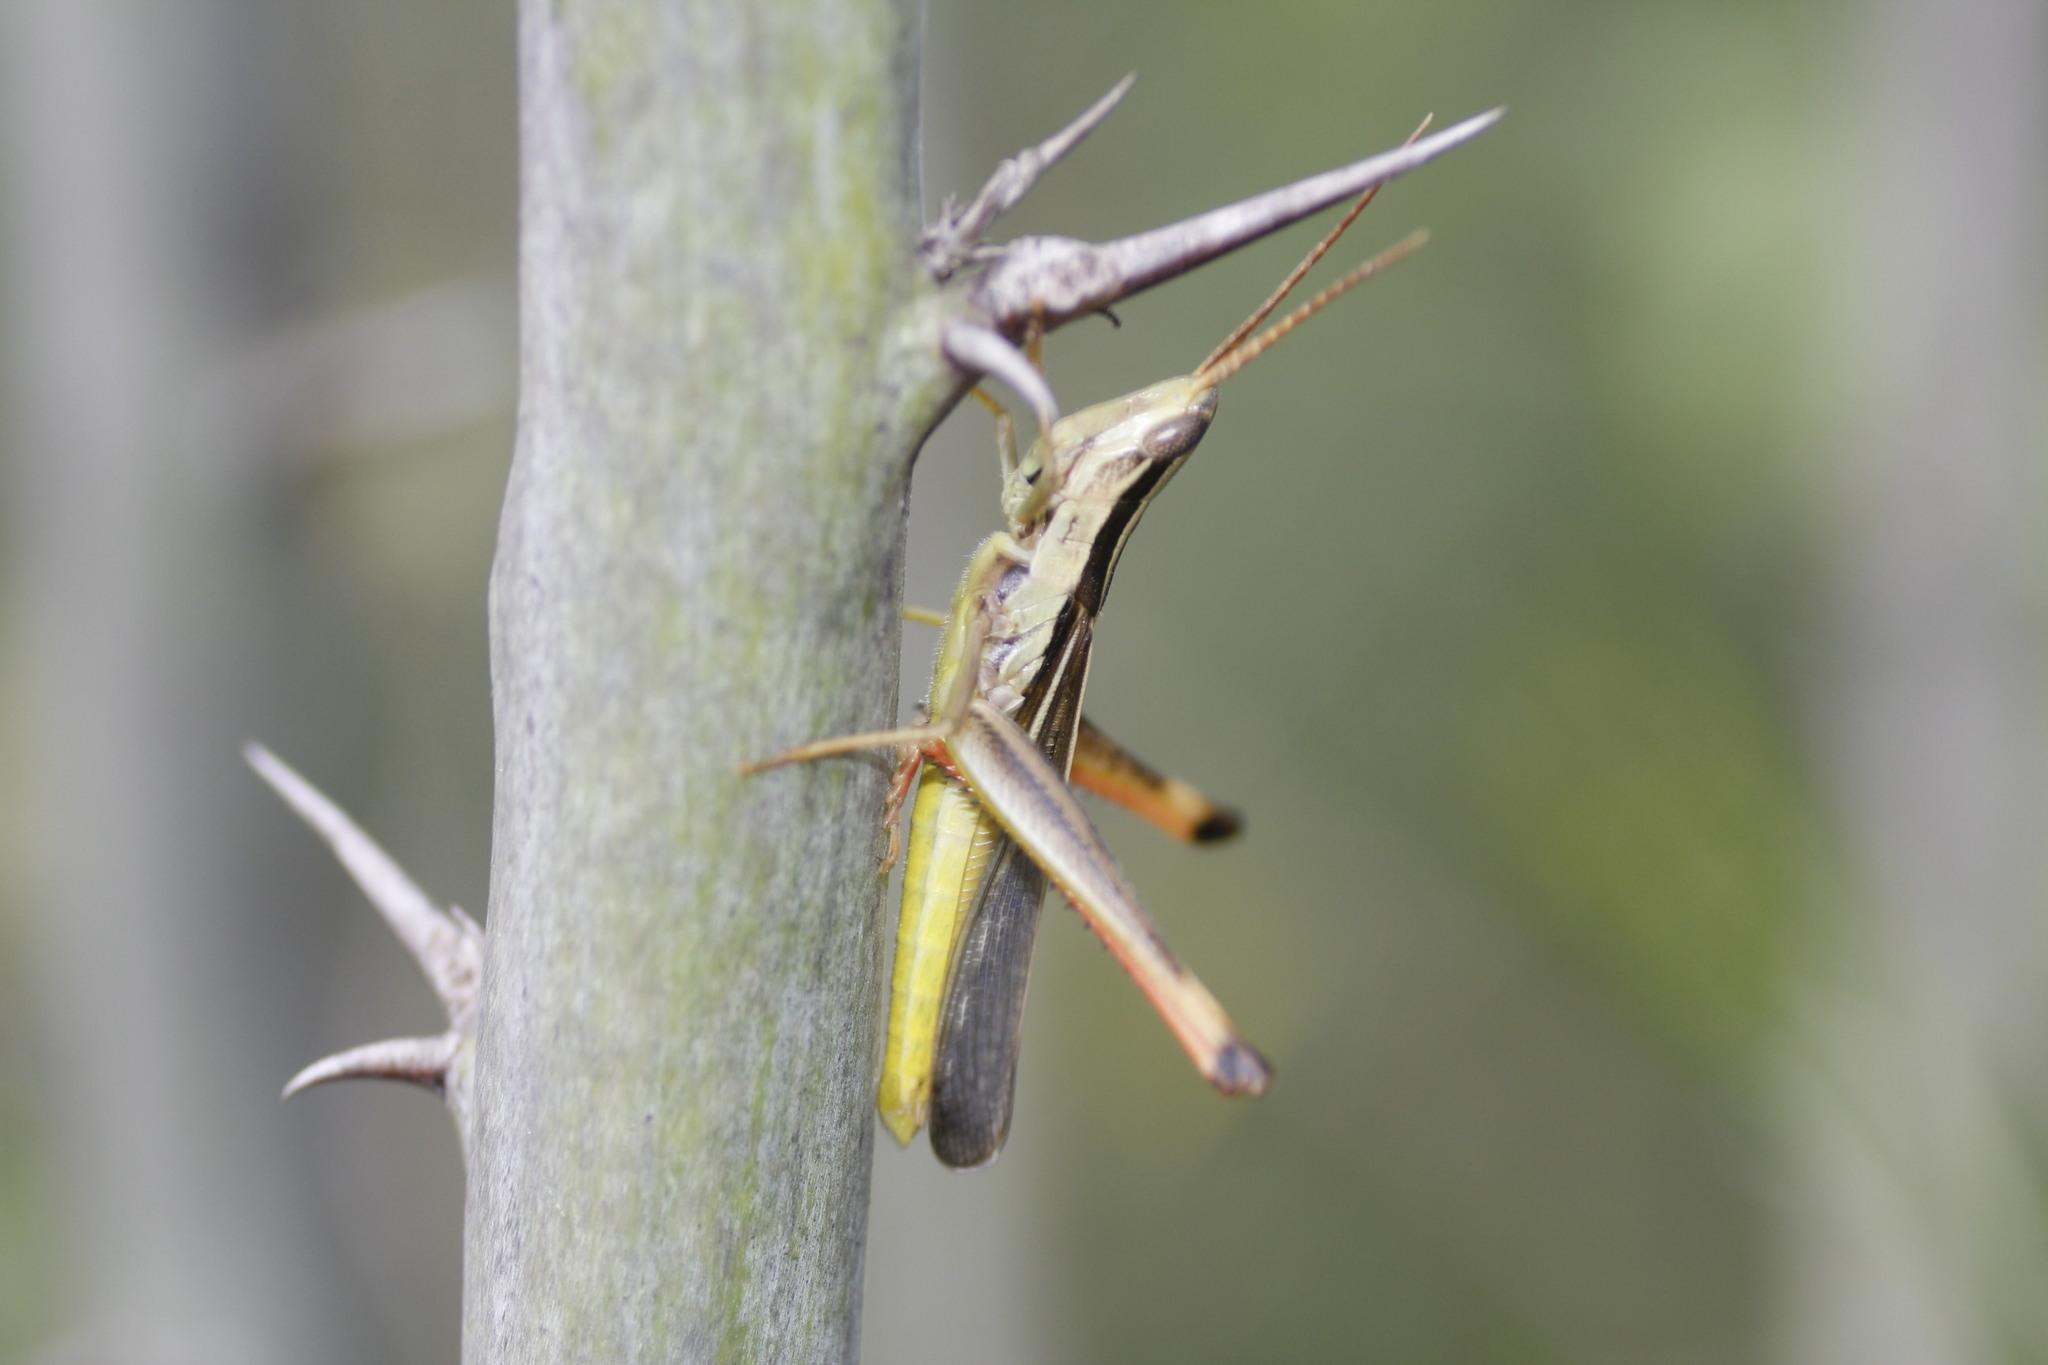 Image of Lively Mermiria